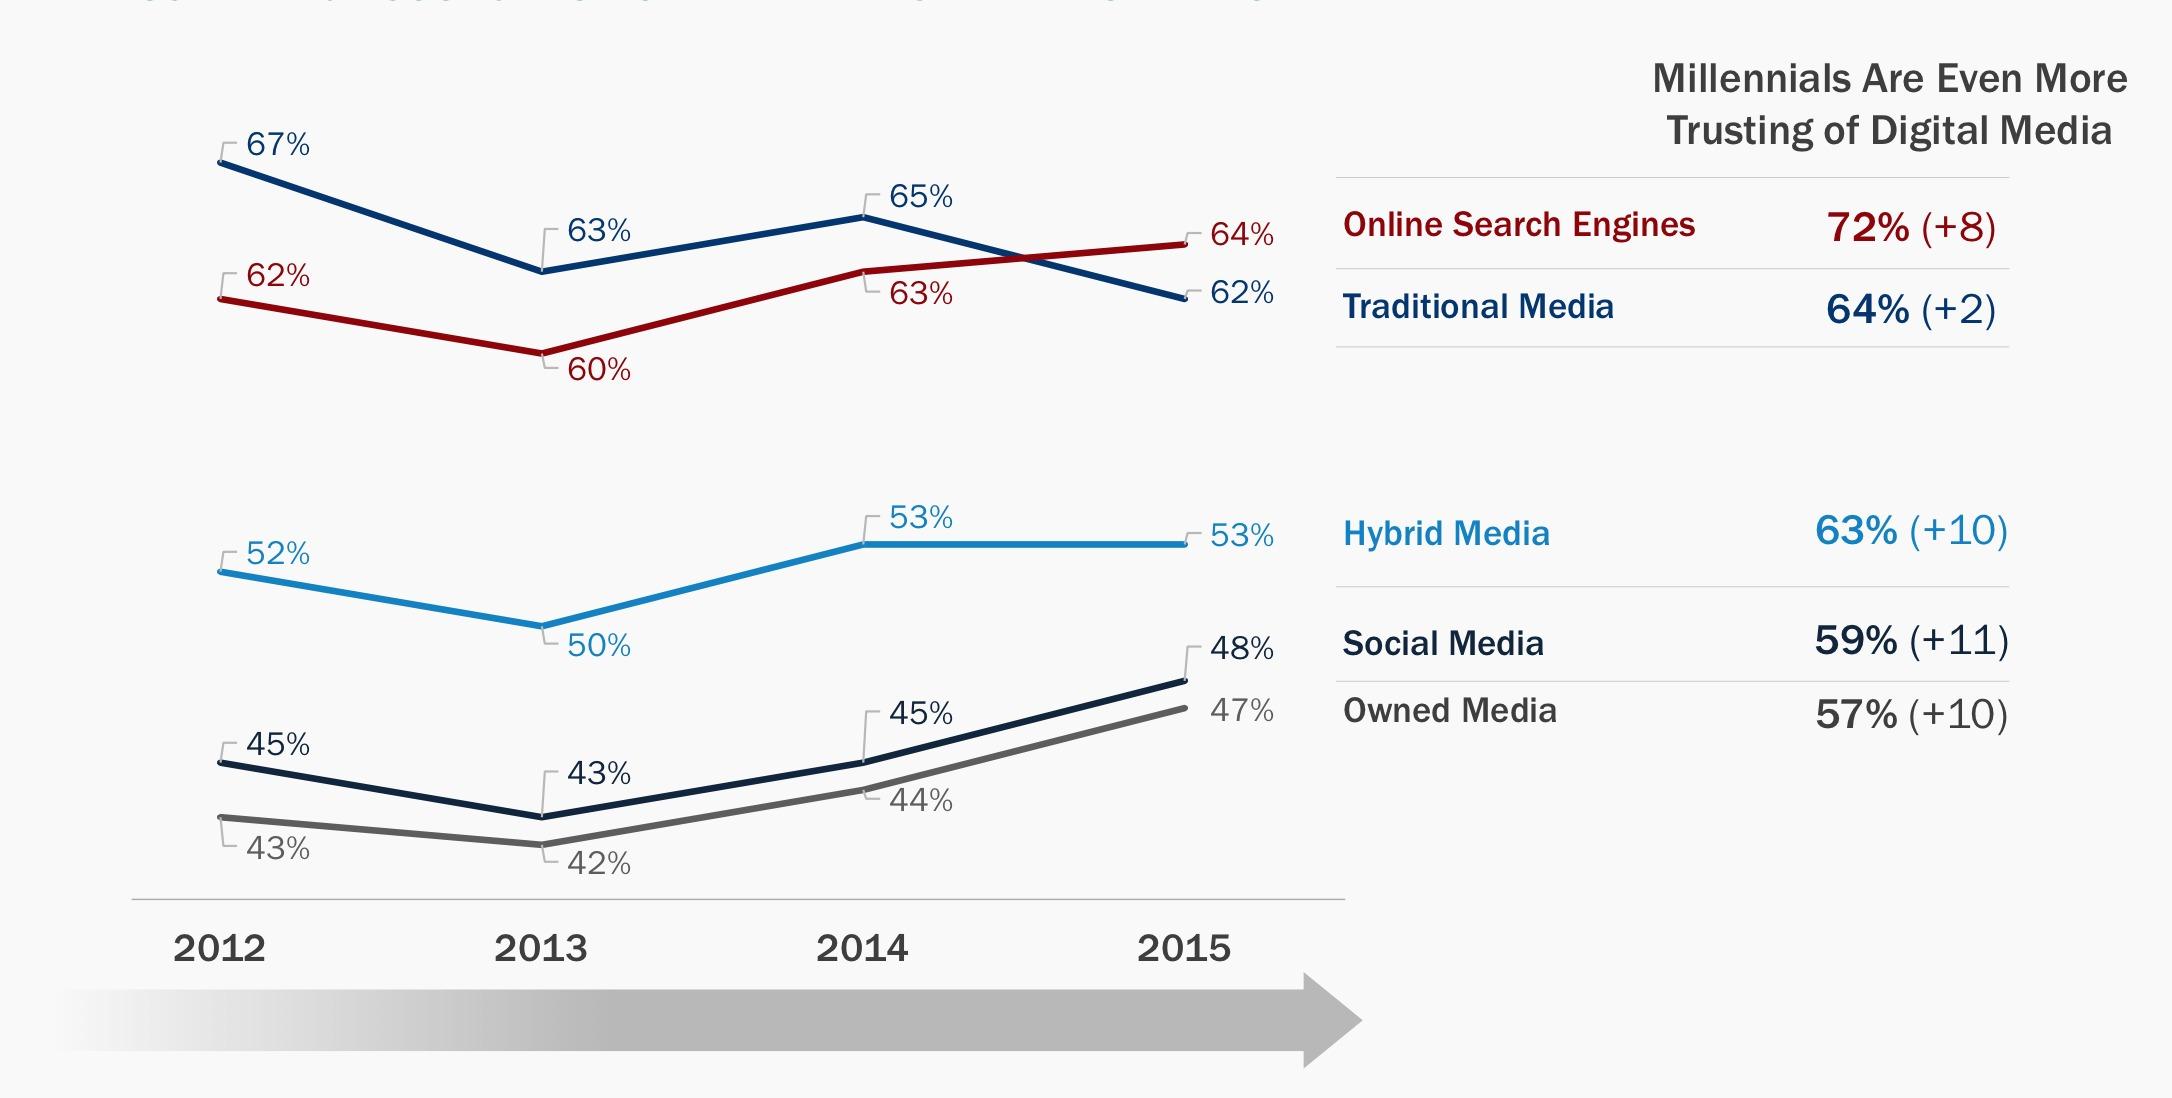 millennials trust in digital media